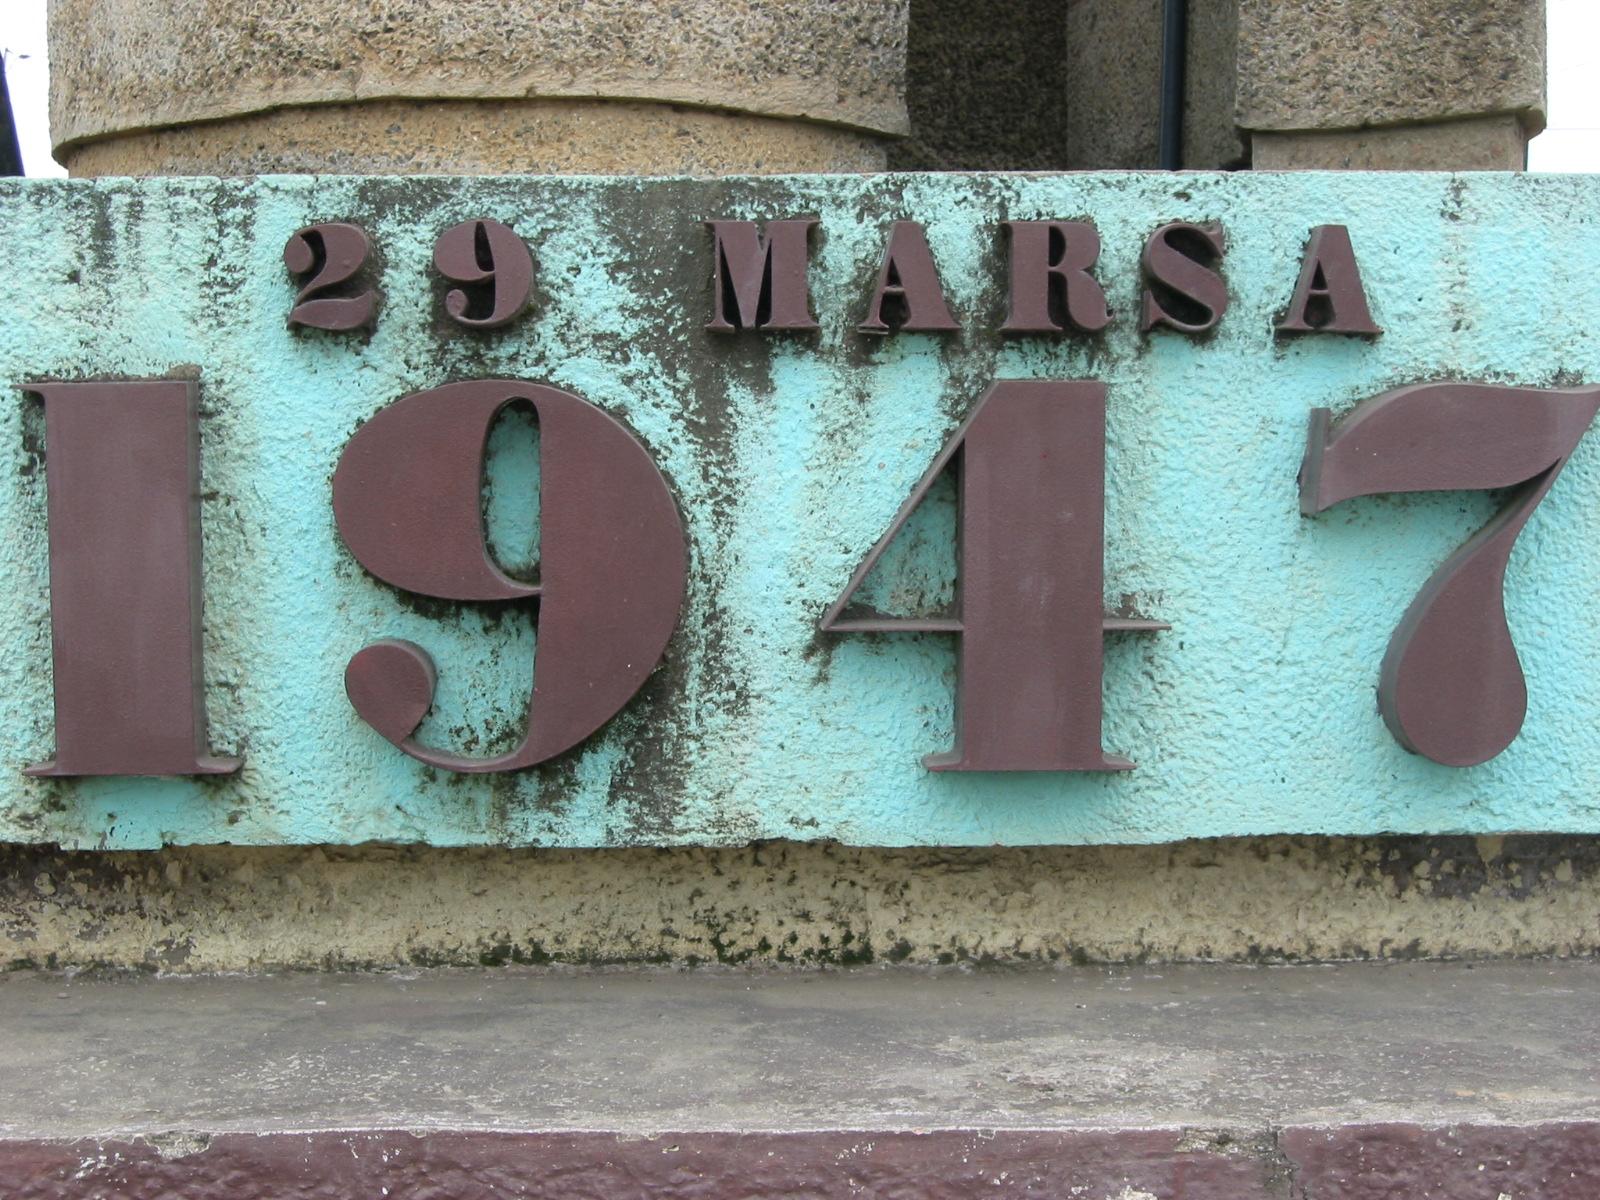 https://i2.wp.com/upload.wikimedia.org/wikipedia/commons/b/be/29_Mars_1947_Monument.jpg